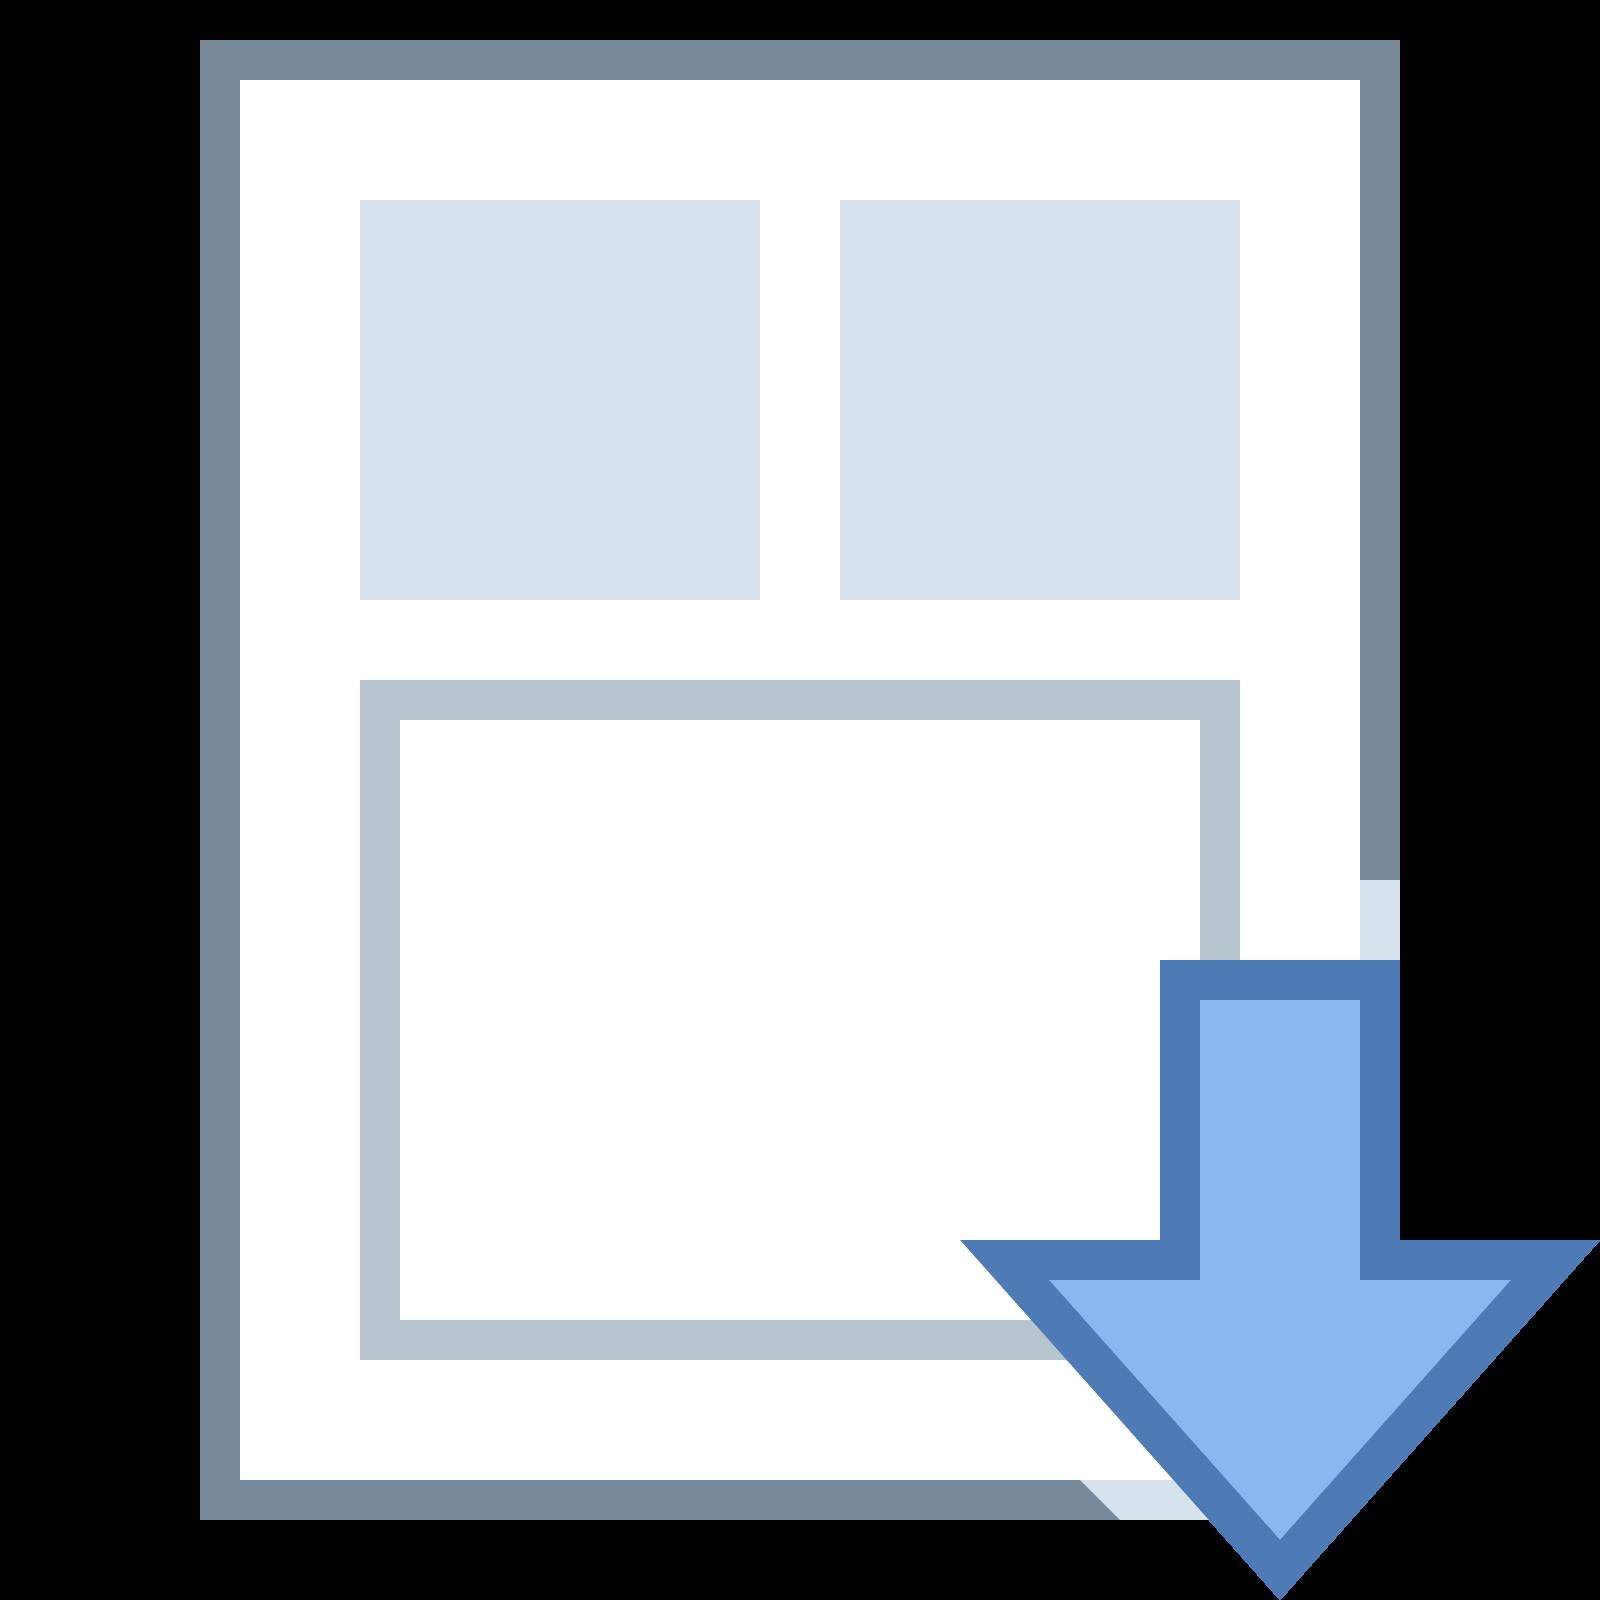 Lebenslauf Vorlage Laden Icon Free Download Png And Vector